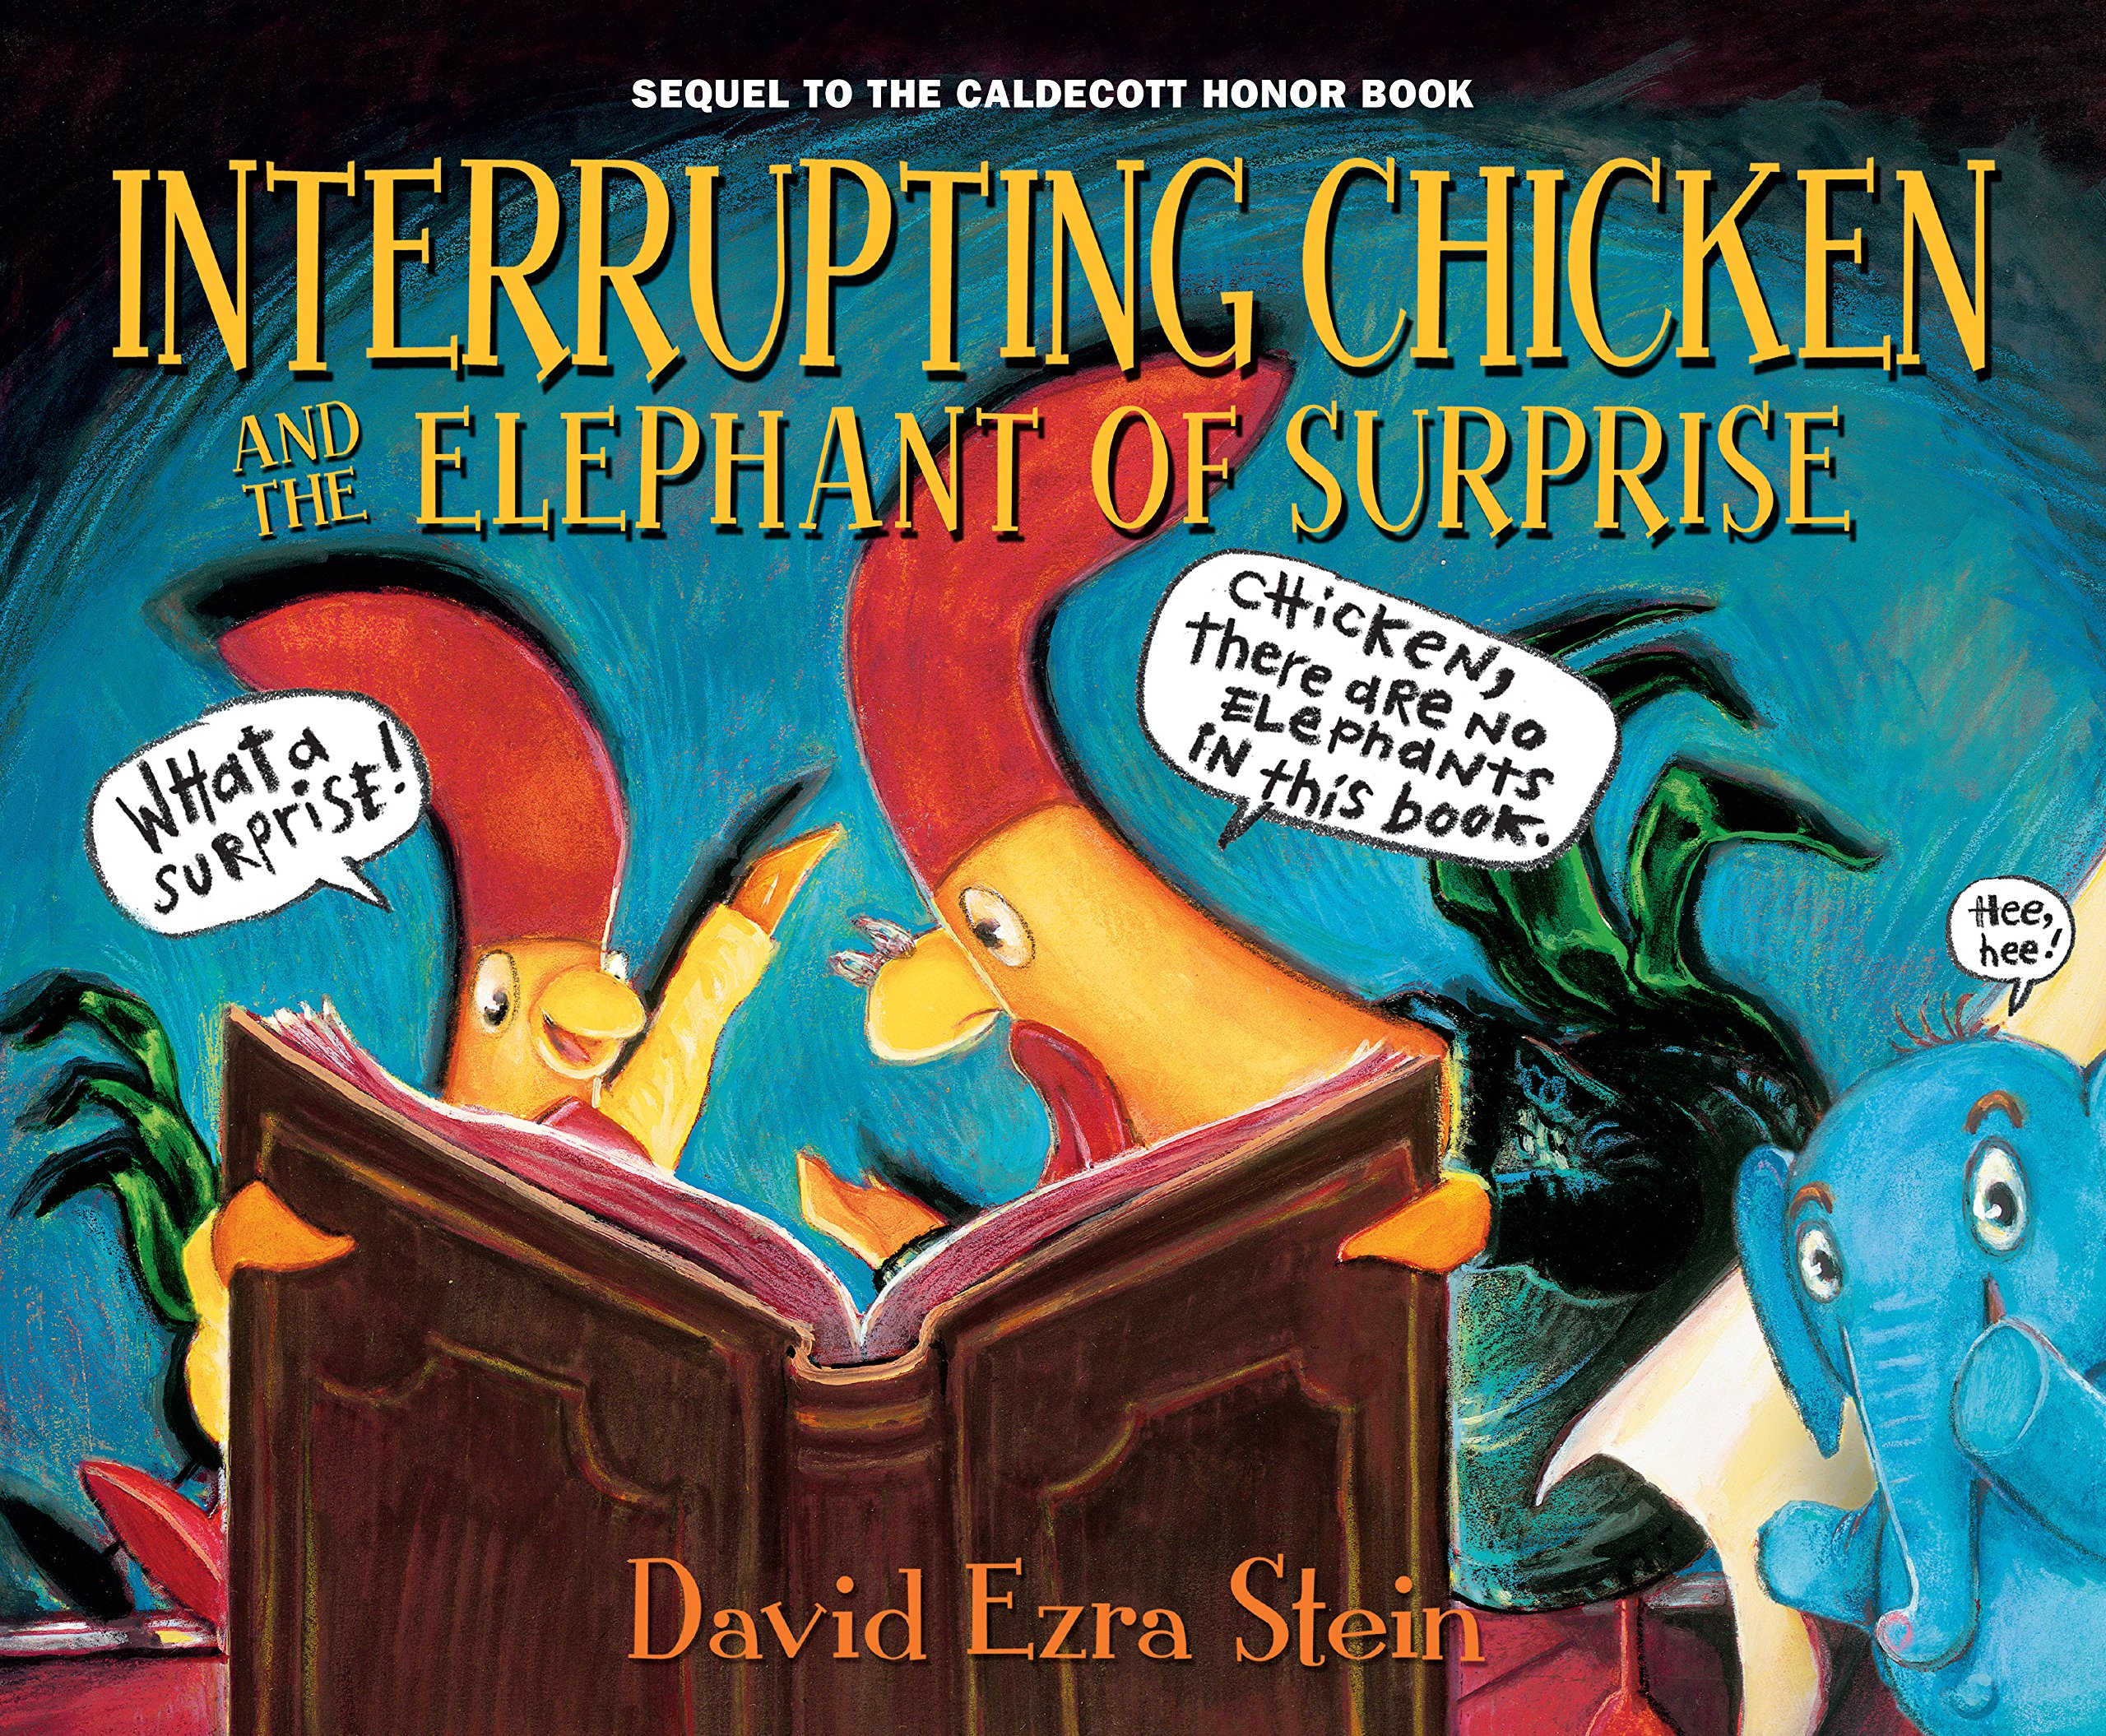 Interrupting Chicken: Elephant of Surprise